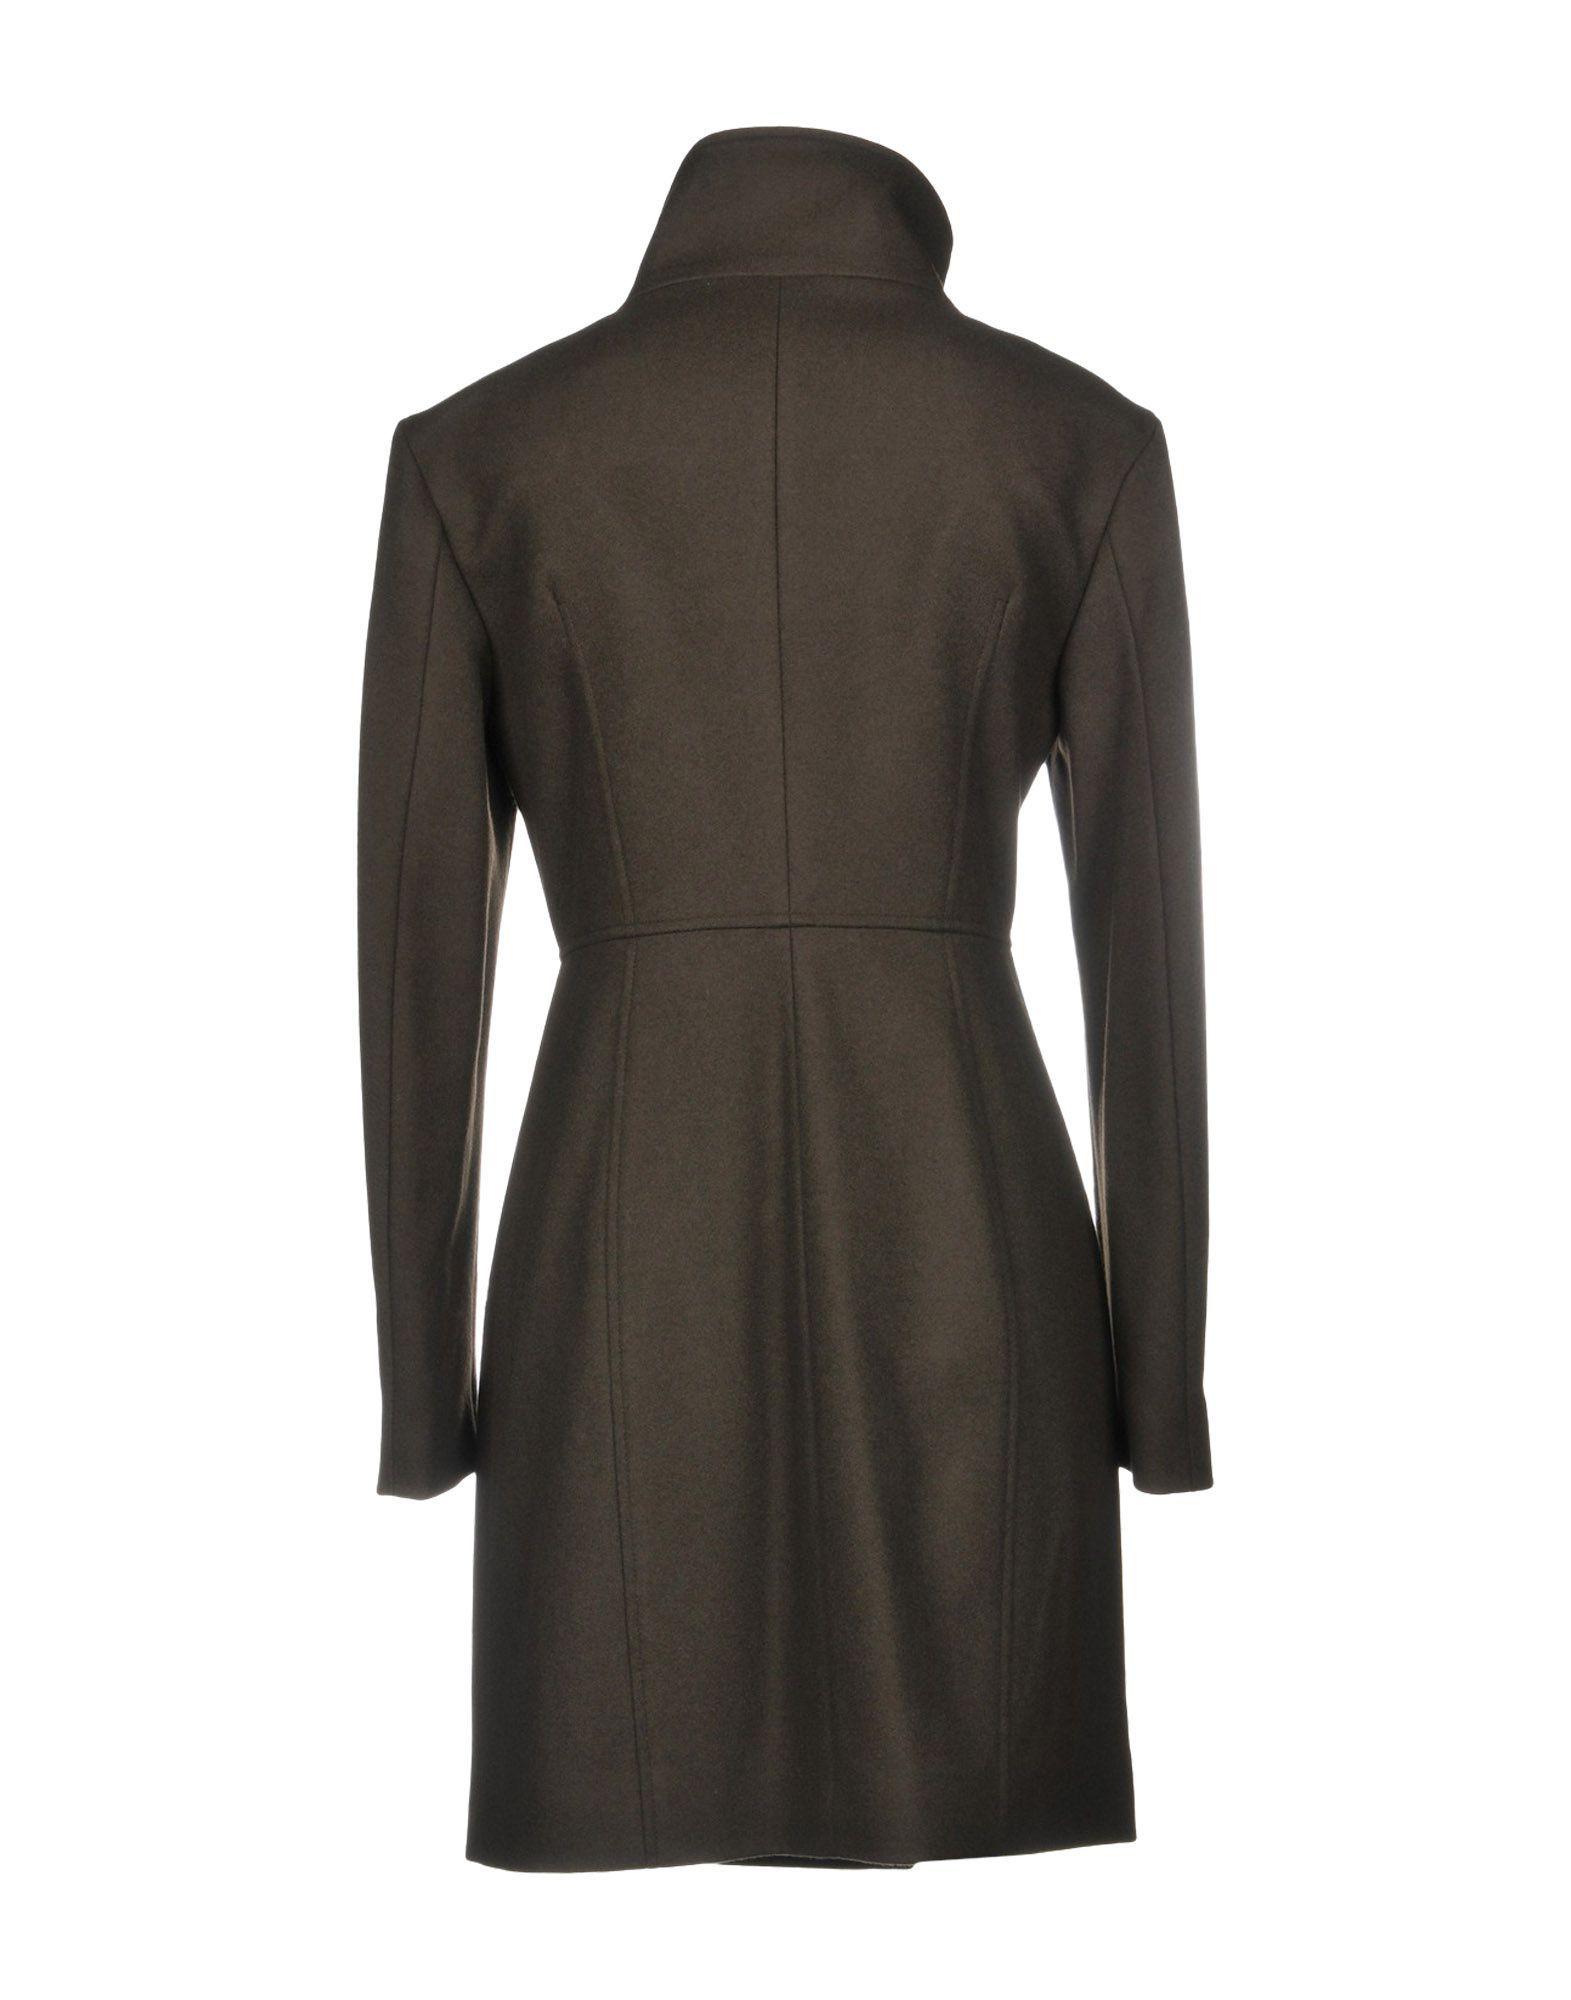 Coat & Jackets Annie P. Dark Brown Women's Virgin Wool